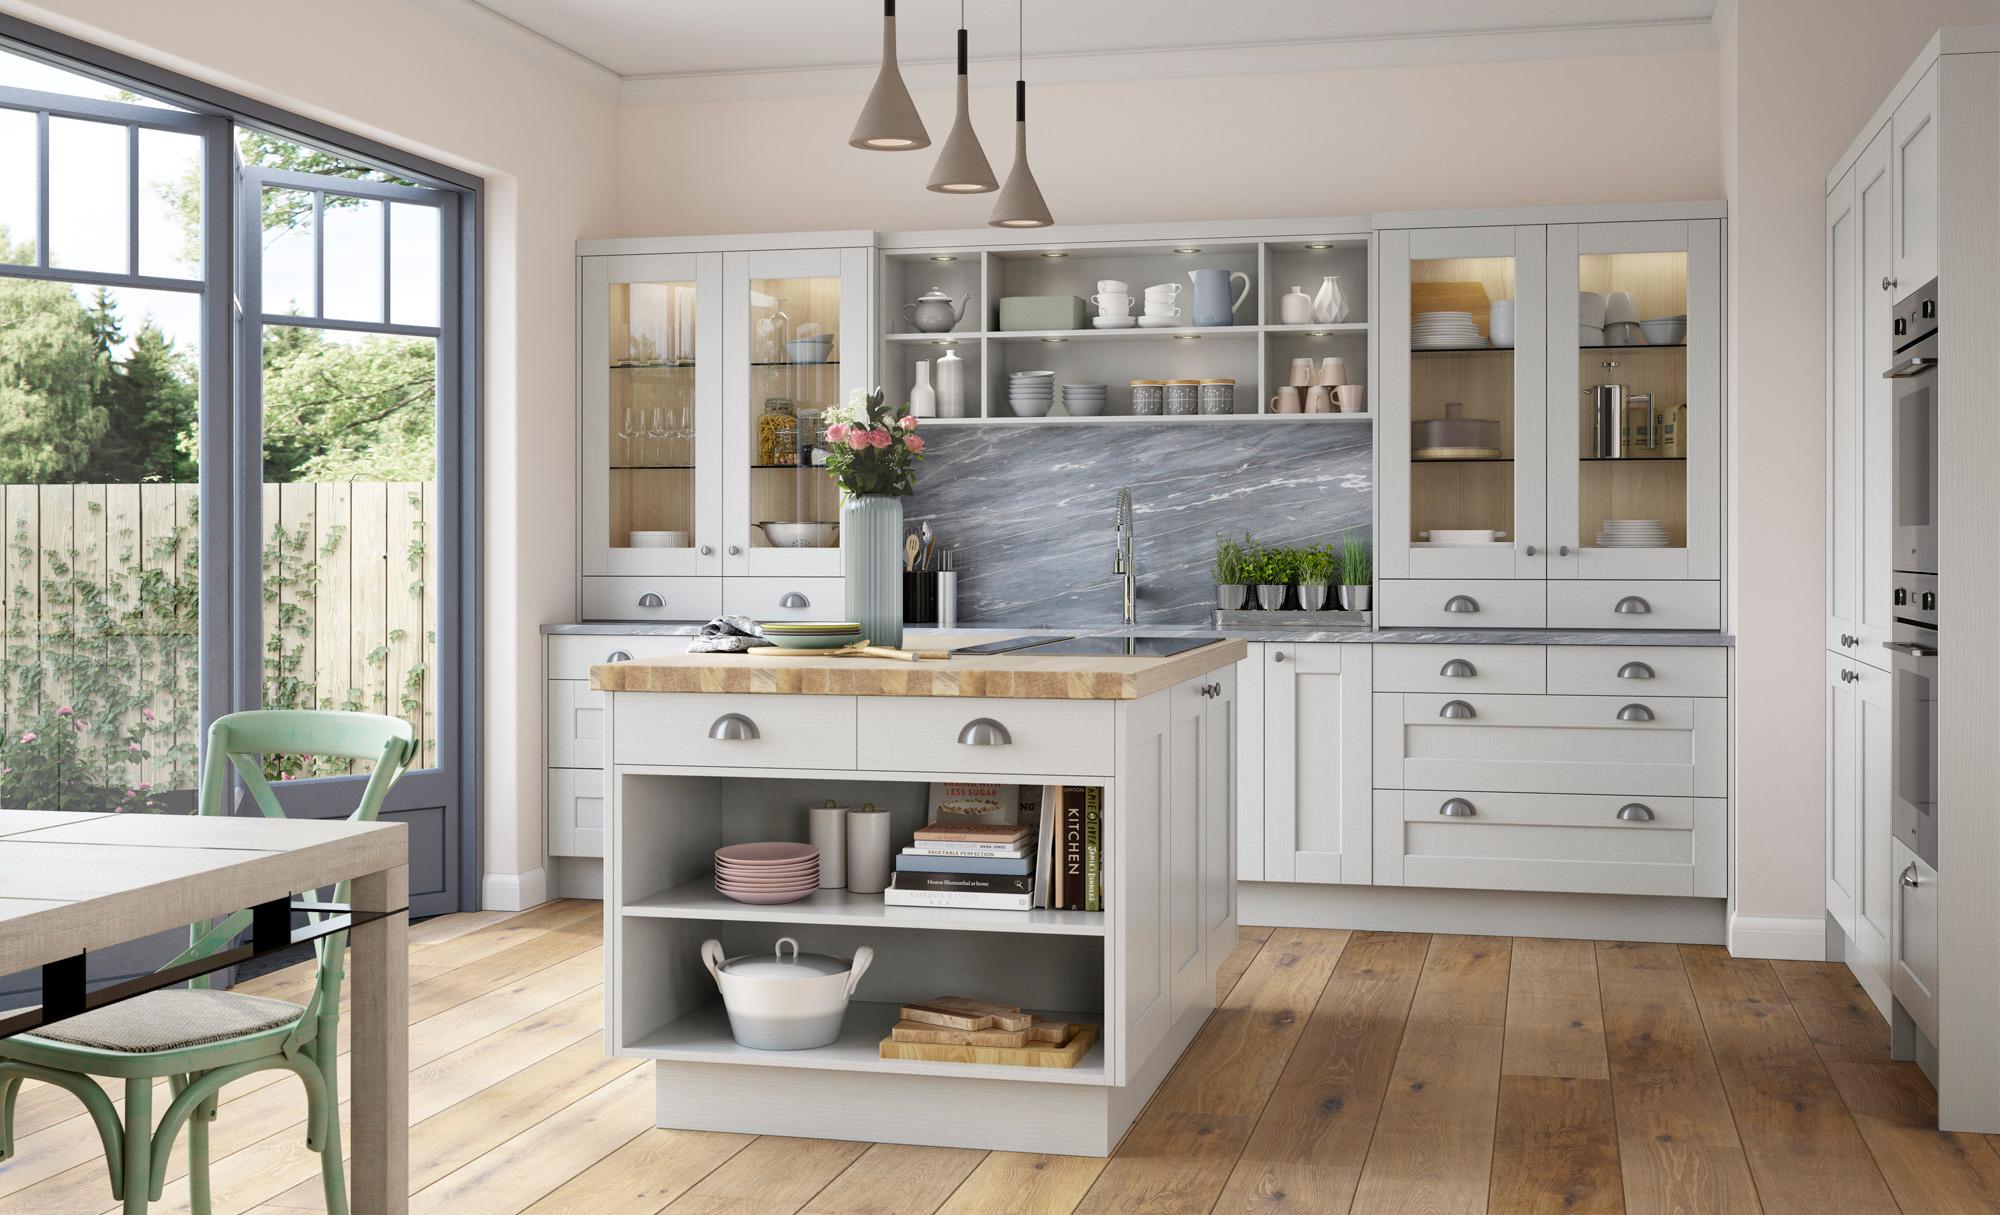 Classic Traditional Kitchen - Kensington Light Grey Kitchen - Kitchen Design - Alan Kelly Kitchens - Waterford